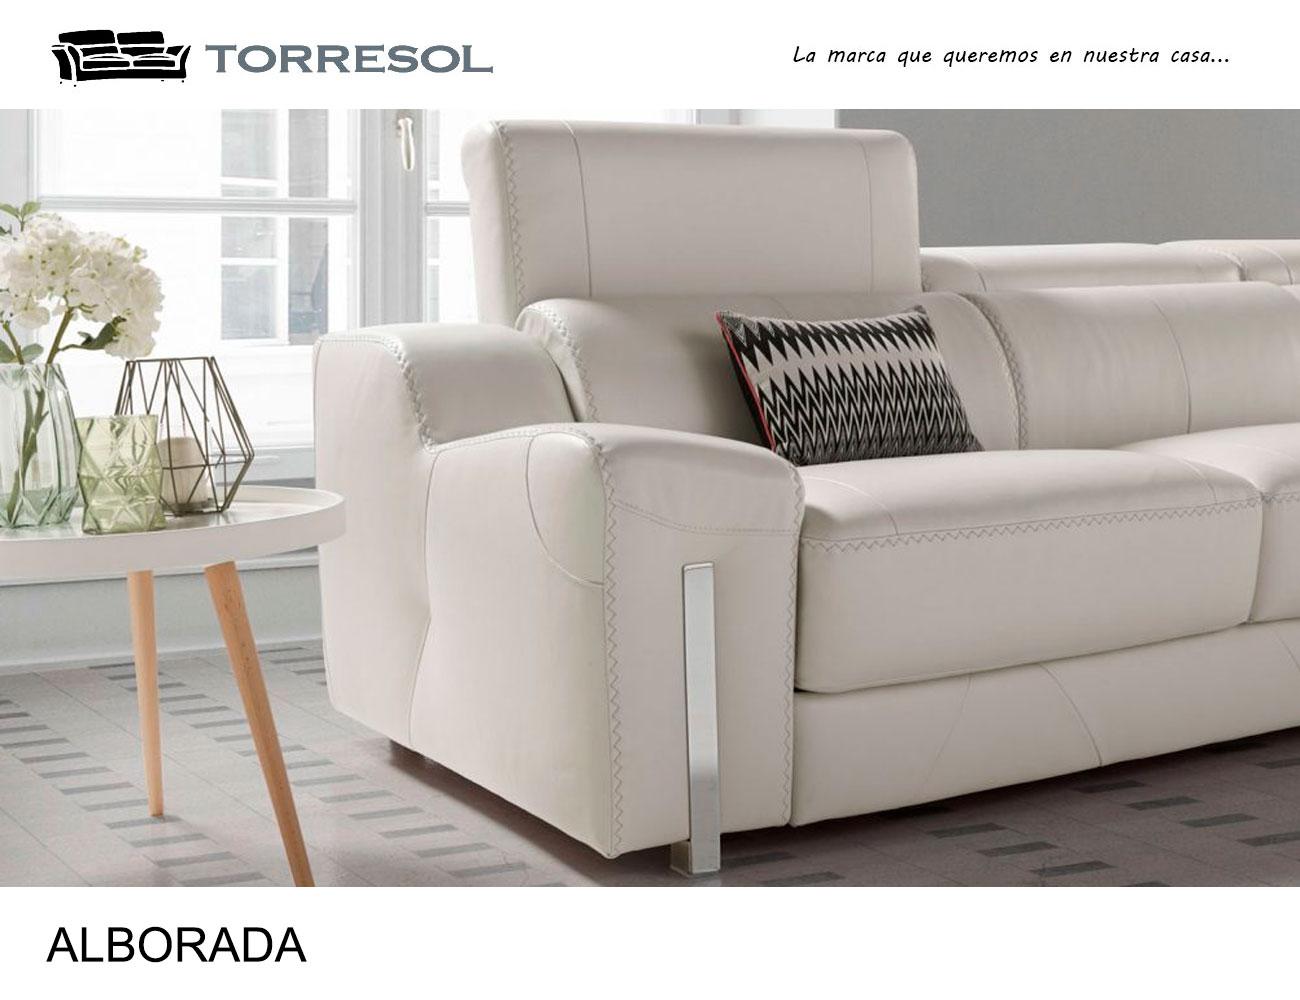 Sofa alborada torresol 1